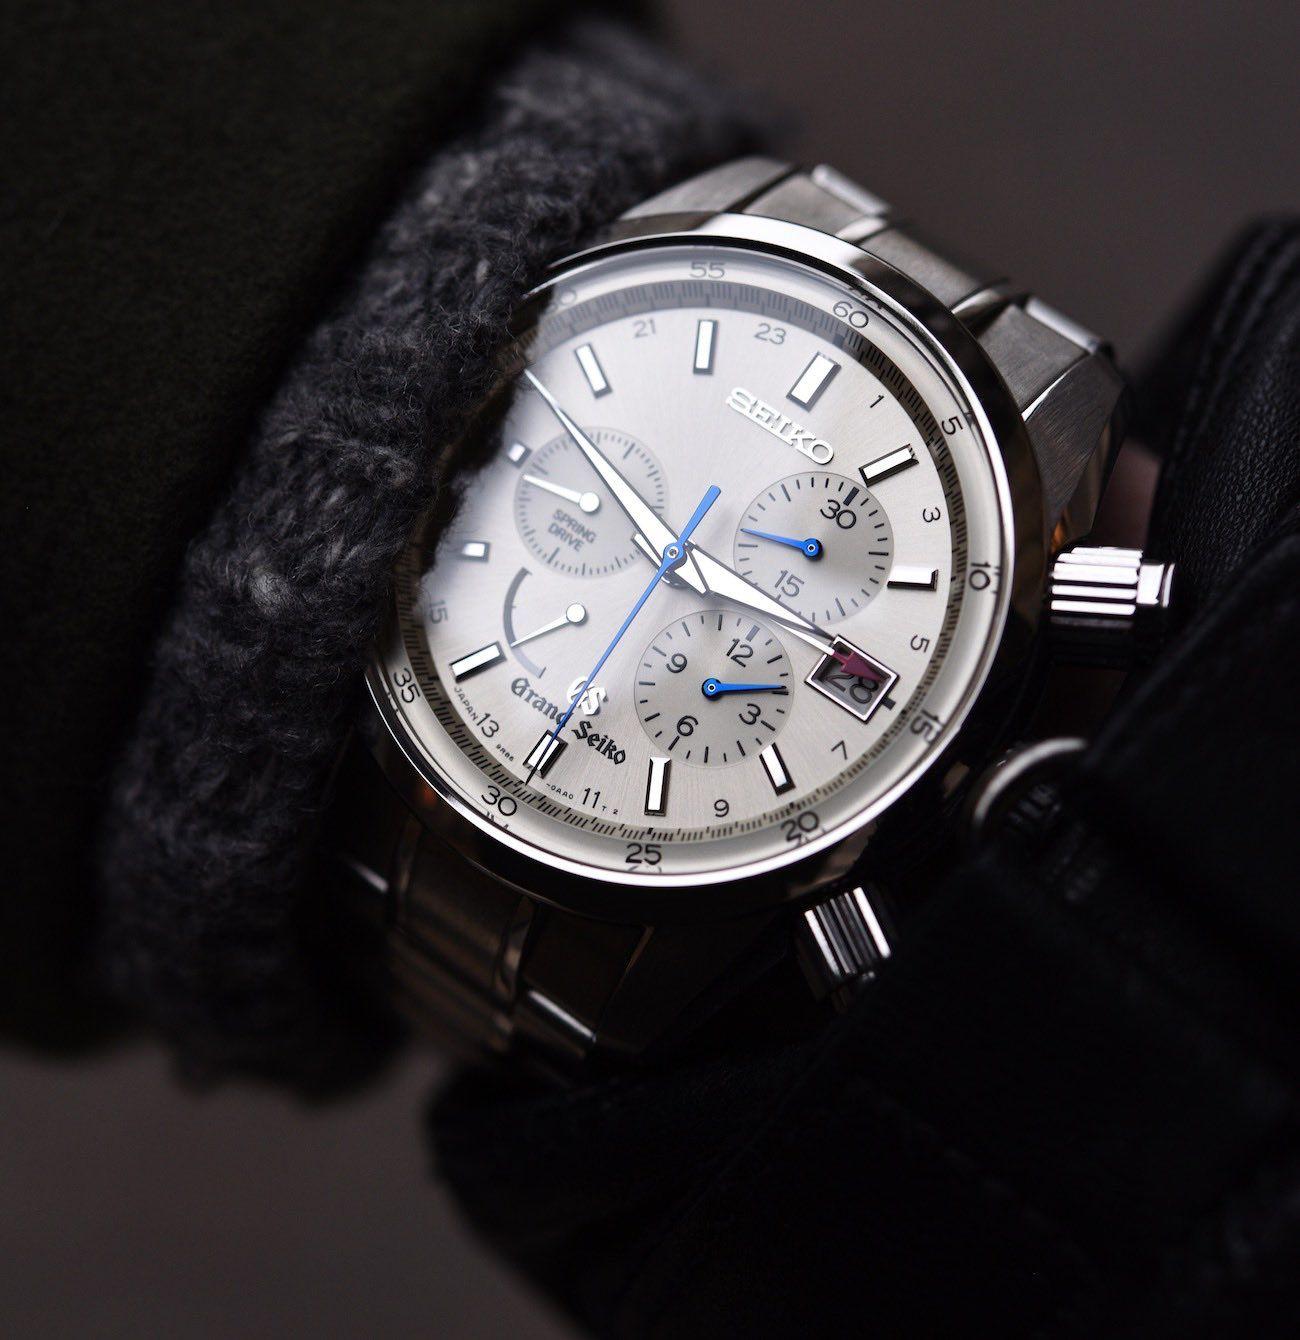 Grand Seiko Spring Drive Chronograph SBGC001 Watch Review ...